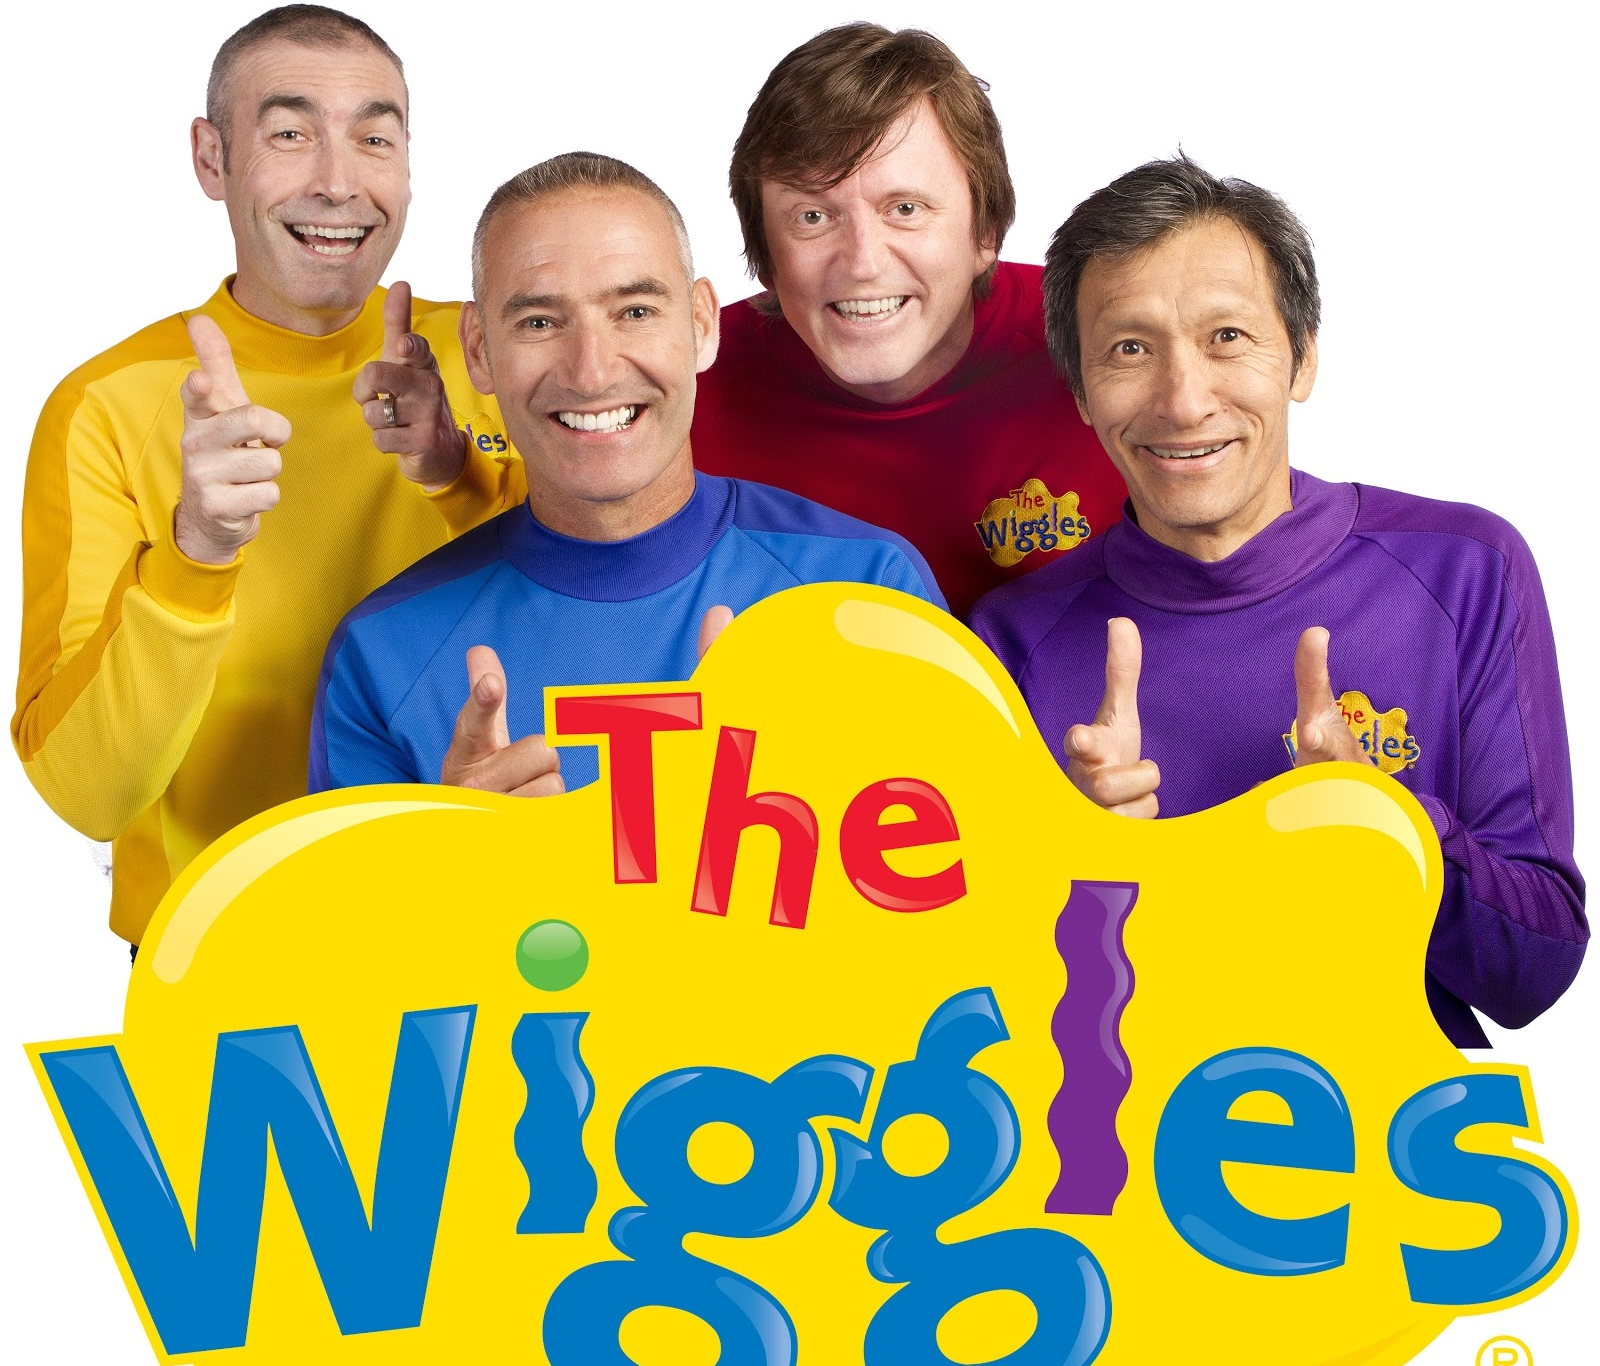 Bacchanal Headliner Announced: The Wiggles